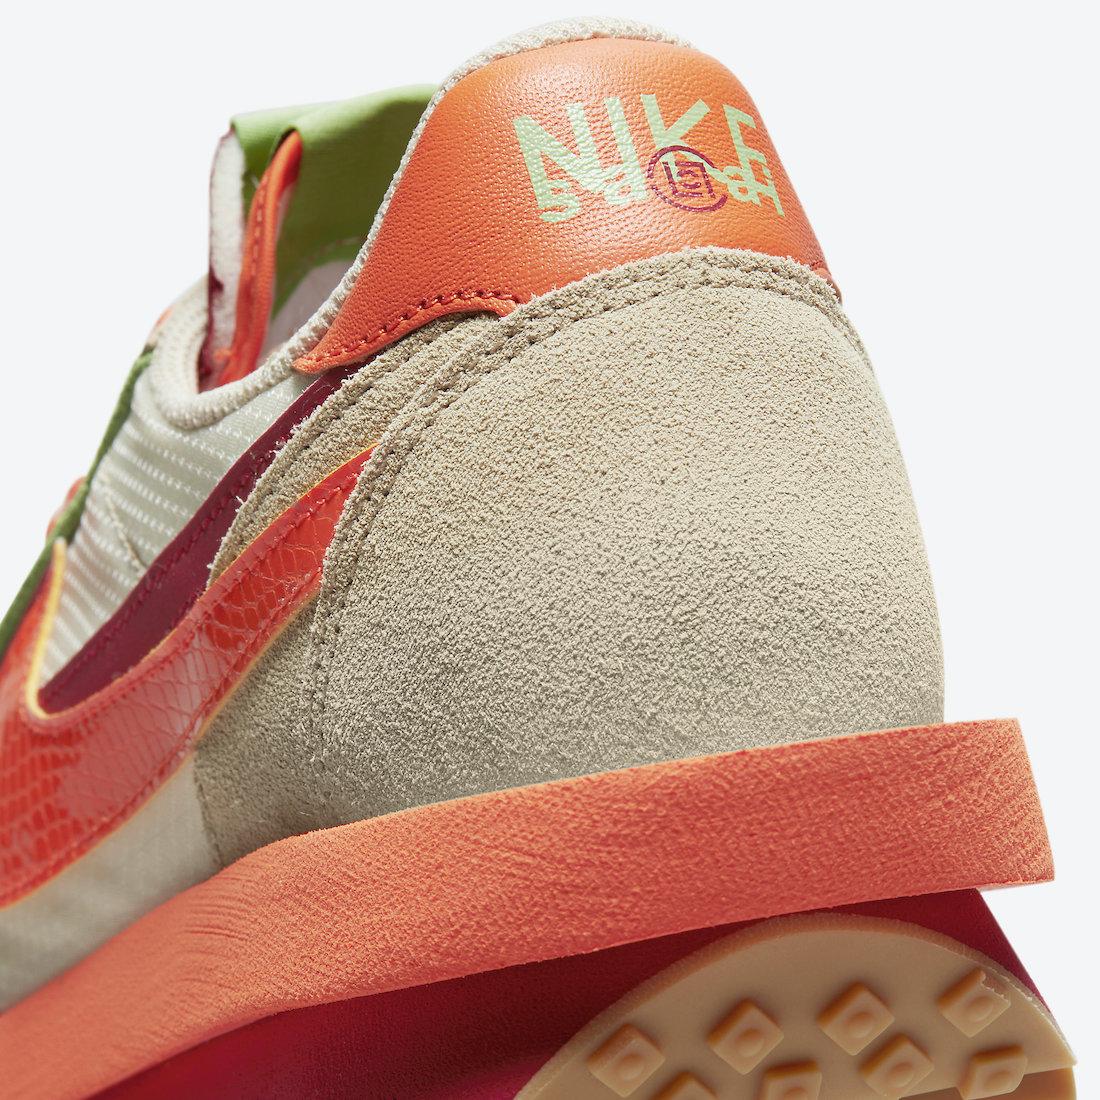 Clot-Sacai-Nike-LDWaffle-Orange-Blaze-DH1347-100-Release-Date-9